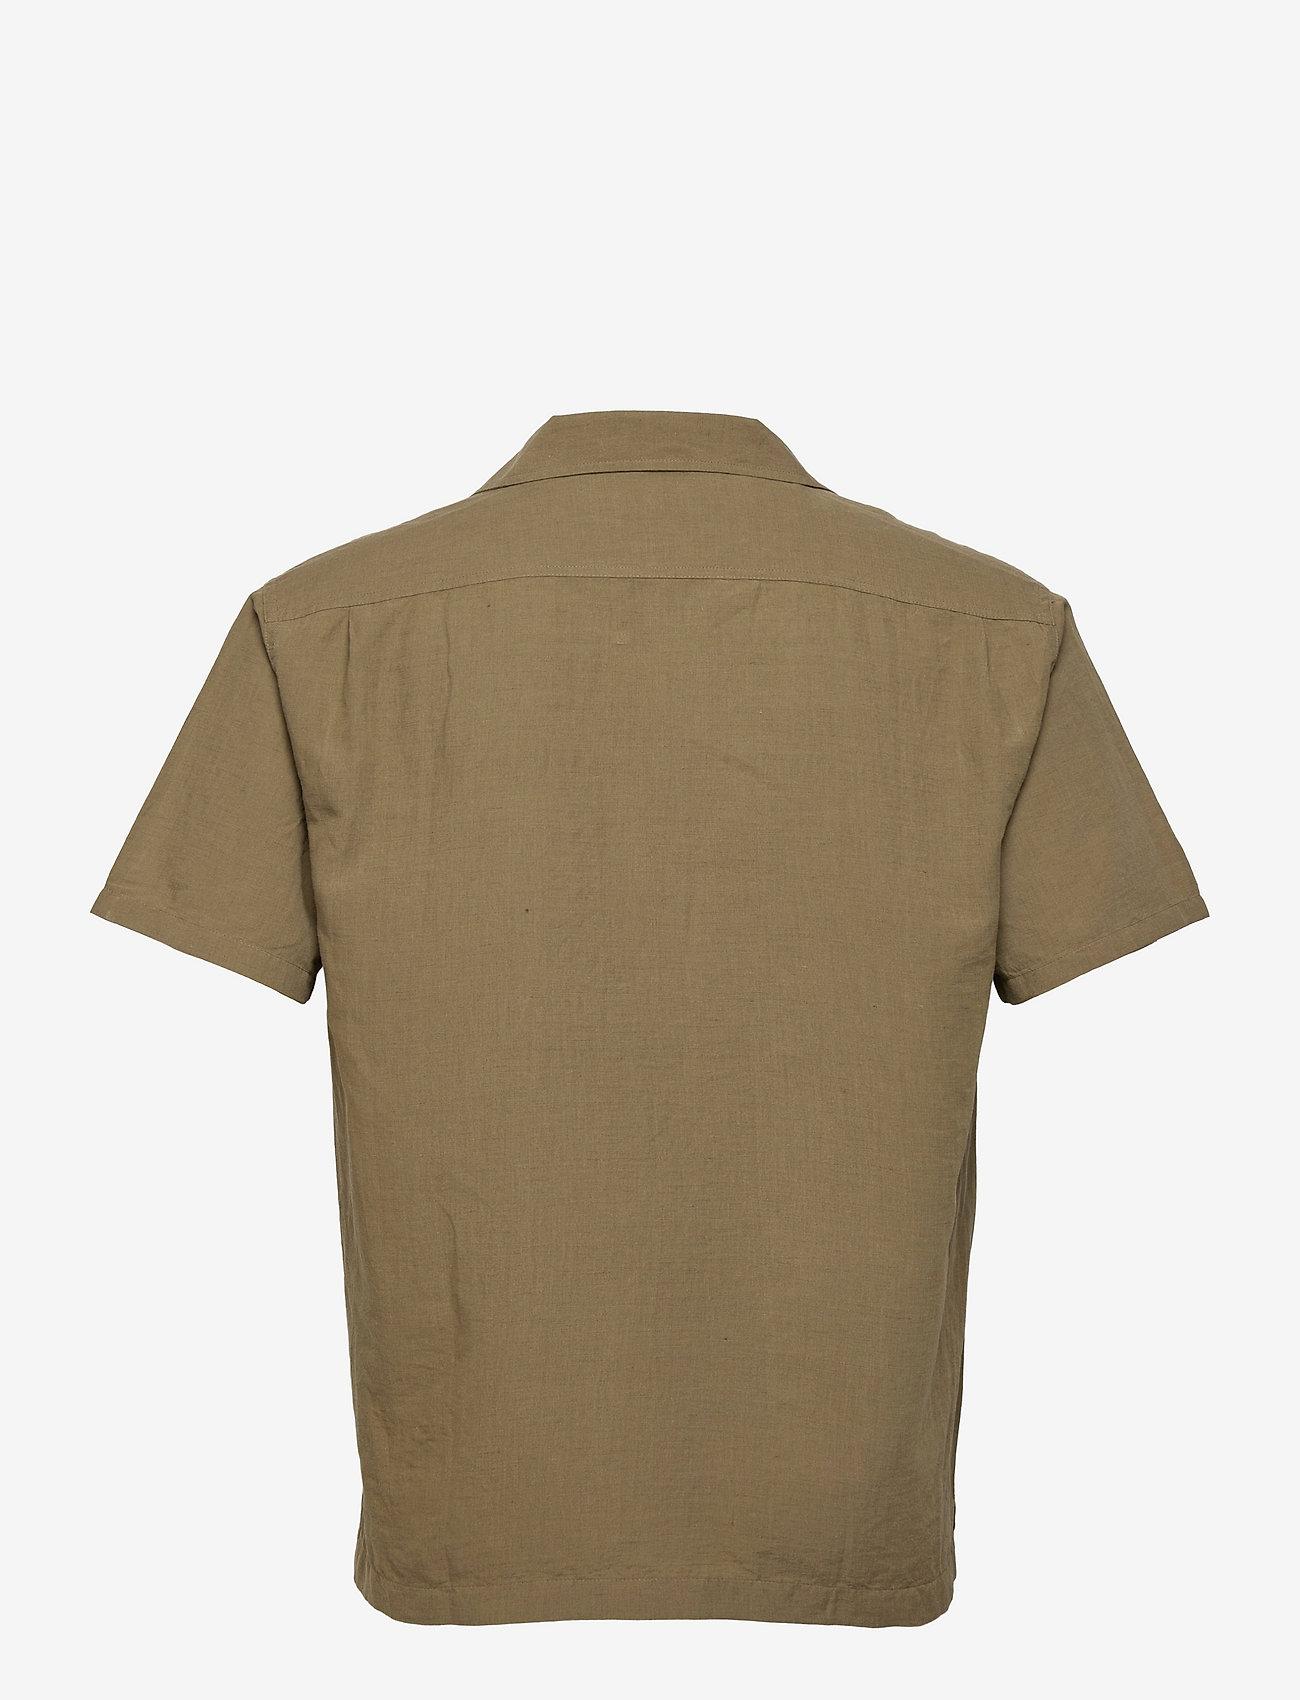 Lee Jeans - SS WORKER SHIRT - basic shirts - cloude dancer - 1